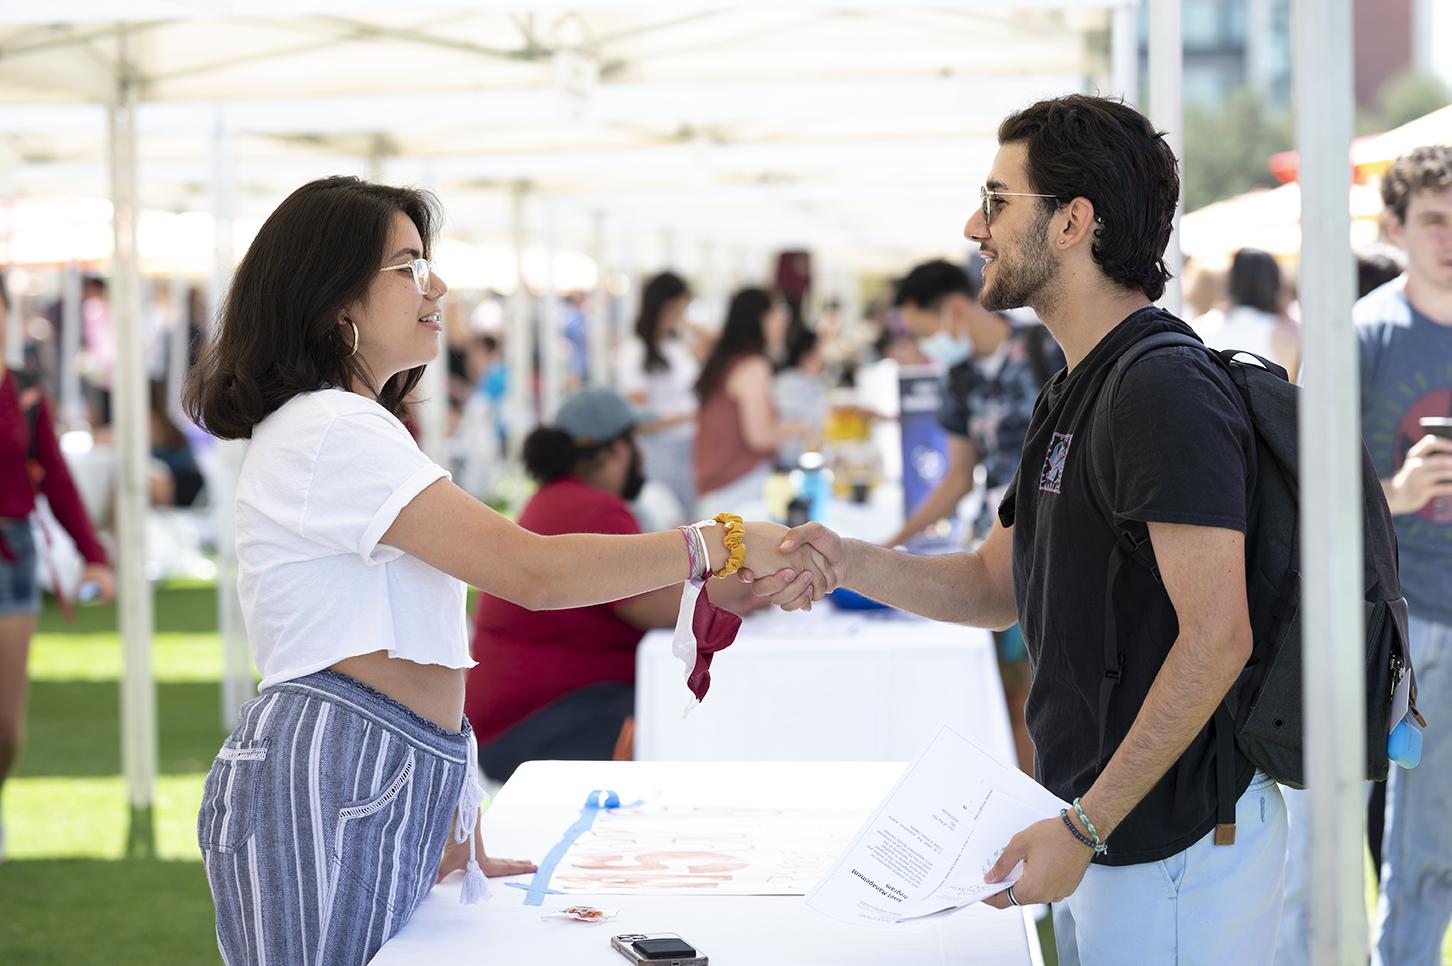 Katherine Esther Almendarez Zuniga '22 (left), Associated Students of Claremont McKenna College president, greets Mohamed Yassin '23 at her organization's booth.